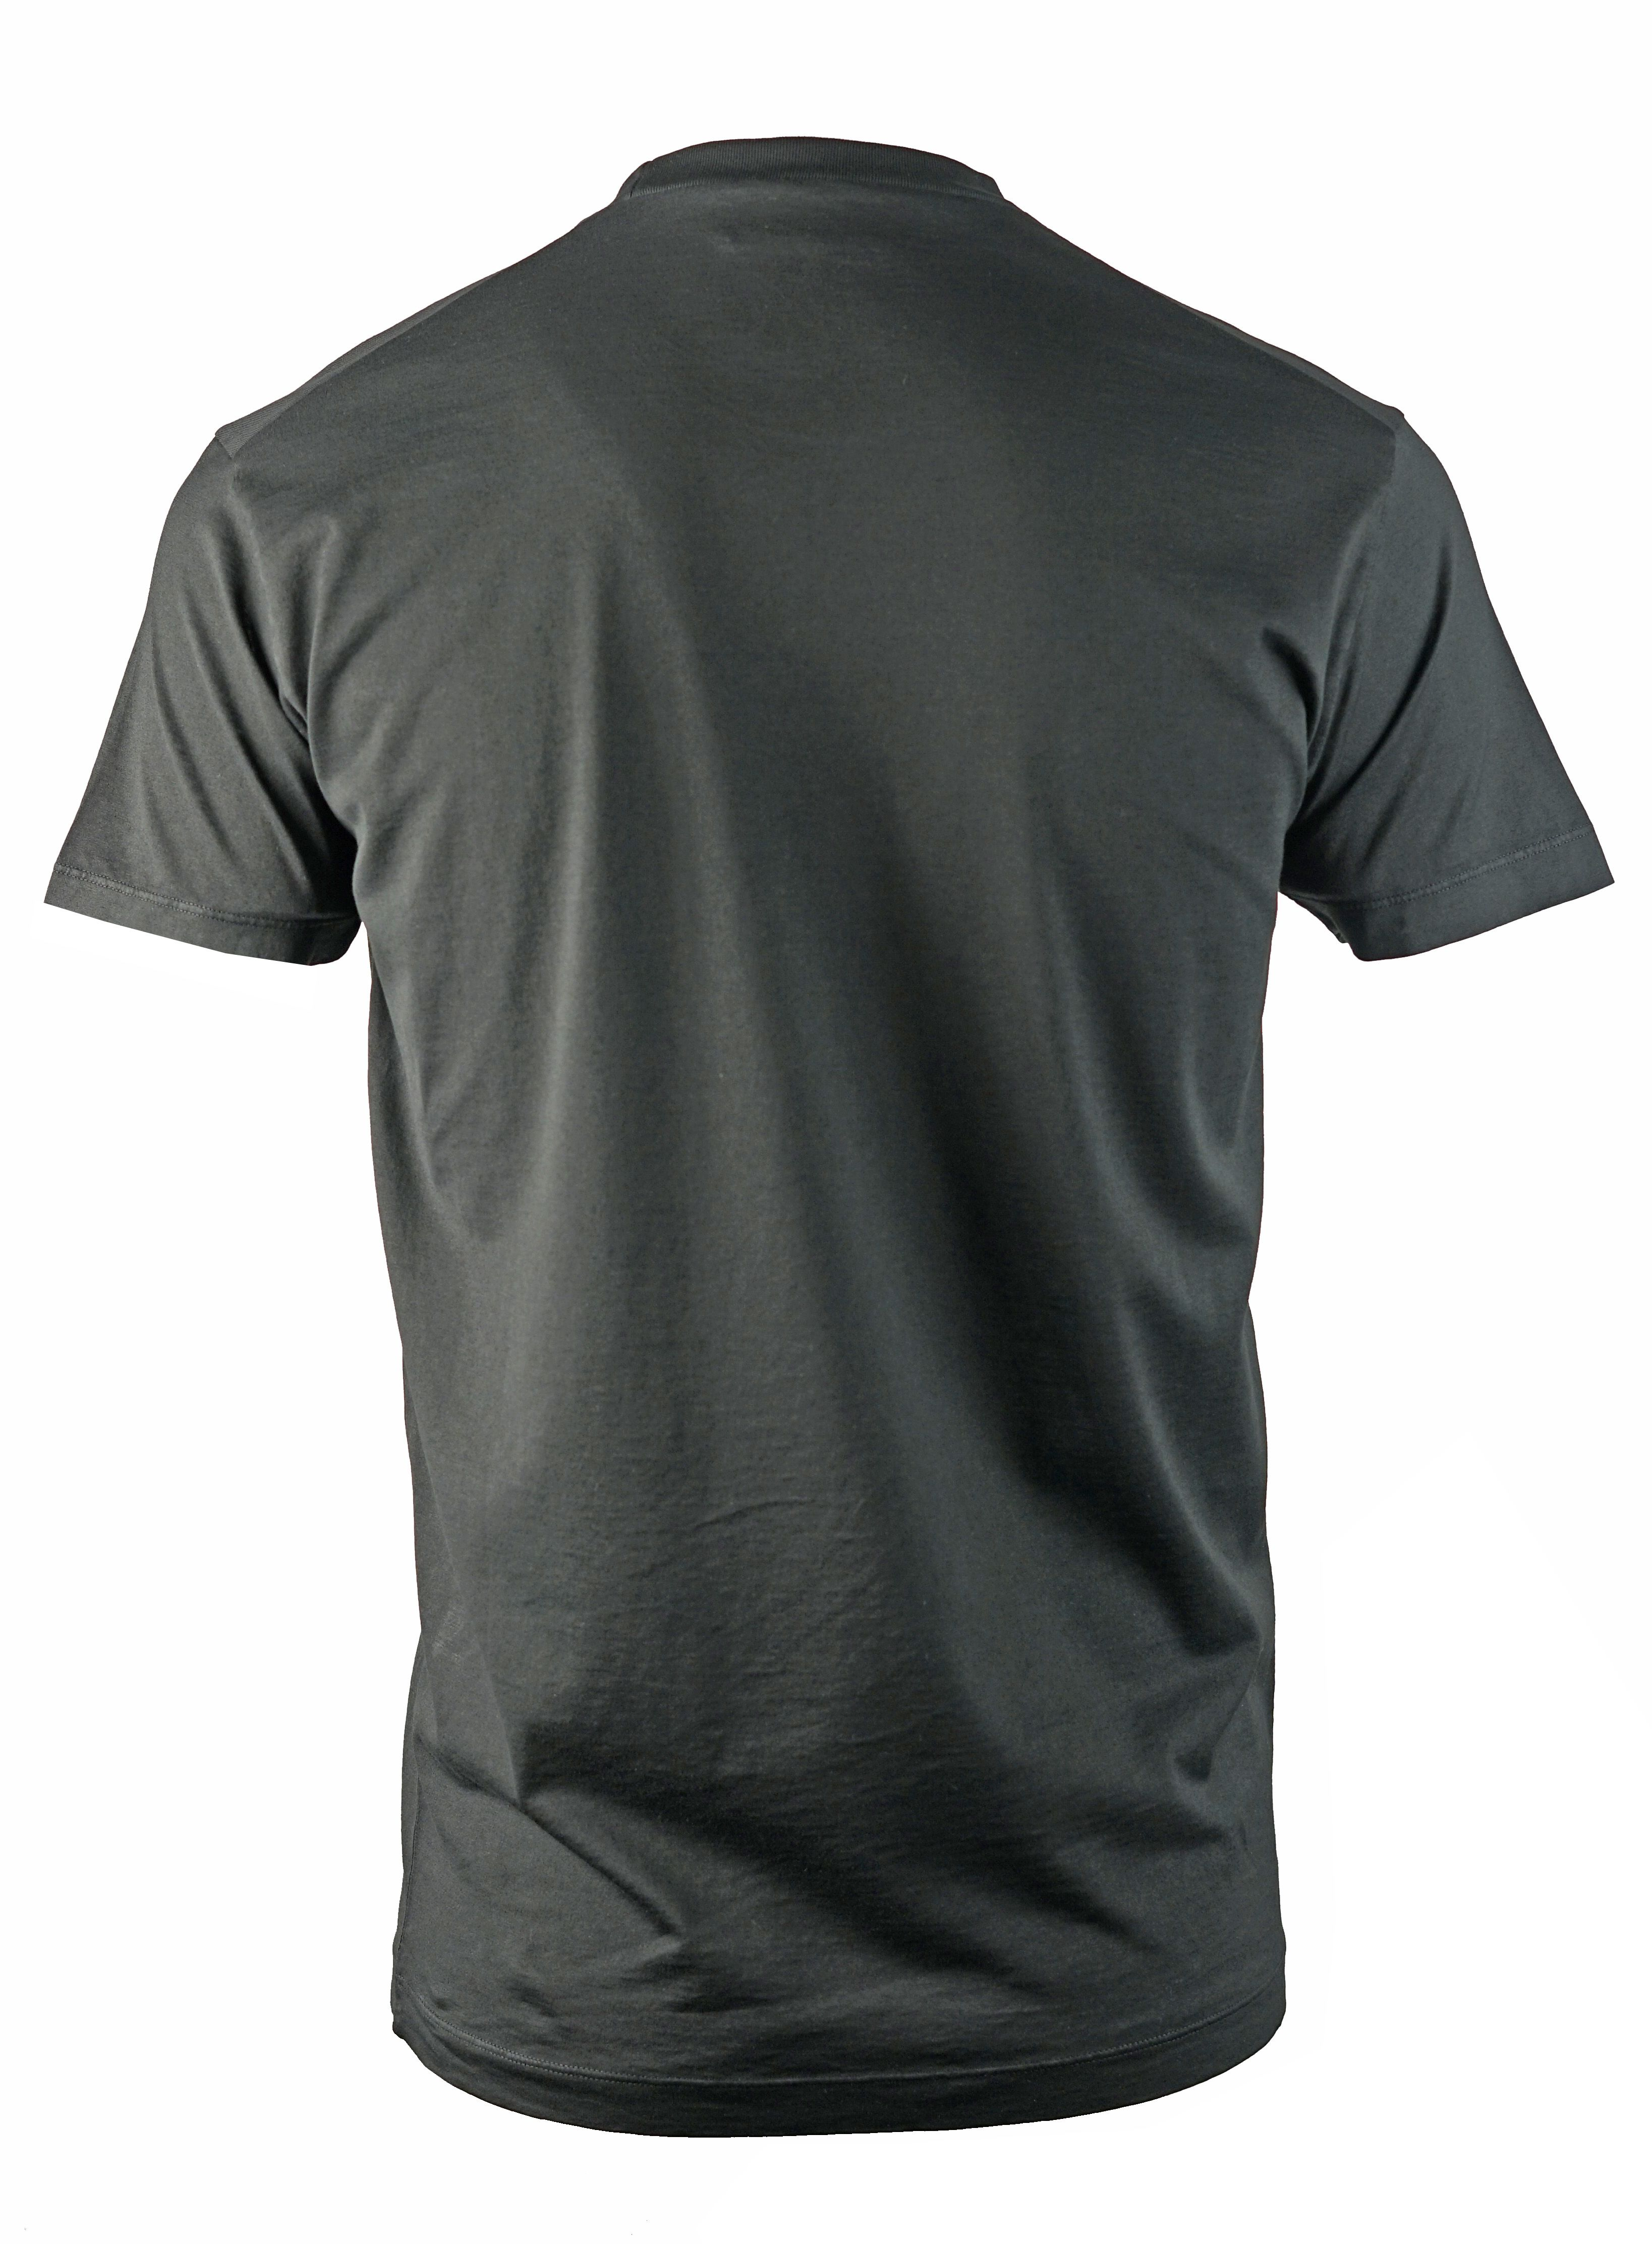 DSquared2 S74GD0494 S22427 900 T-Shirt